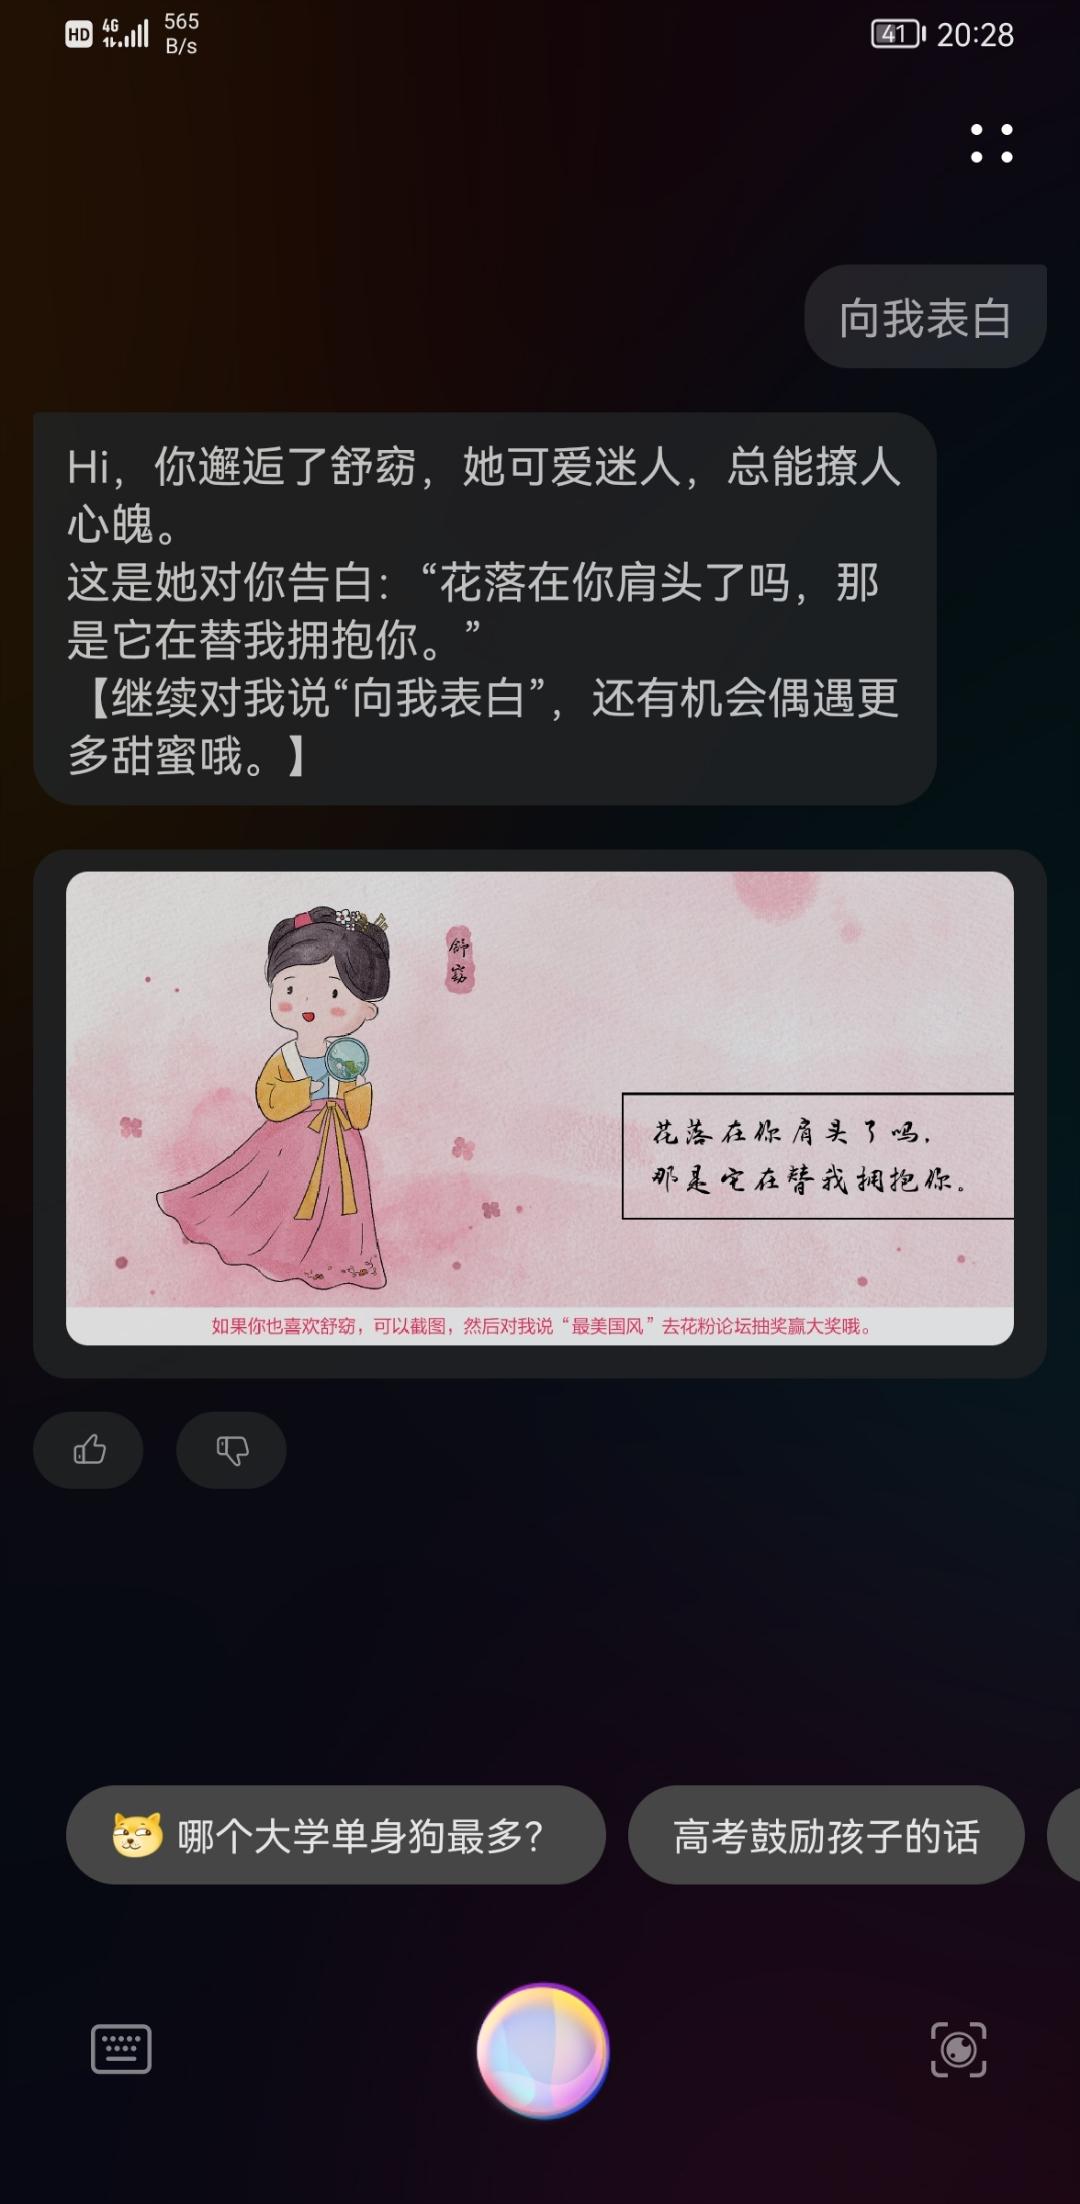 Screenshot_20210611_202830_com.huawei.vassistant.jpg